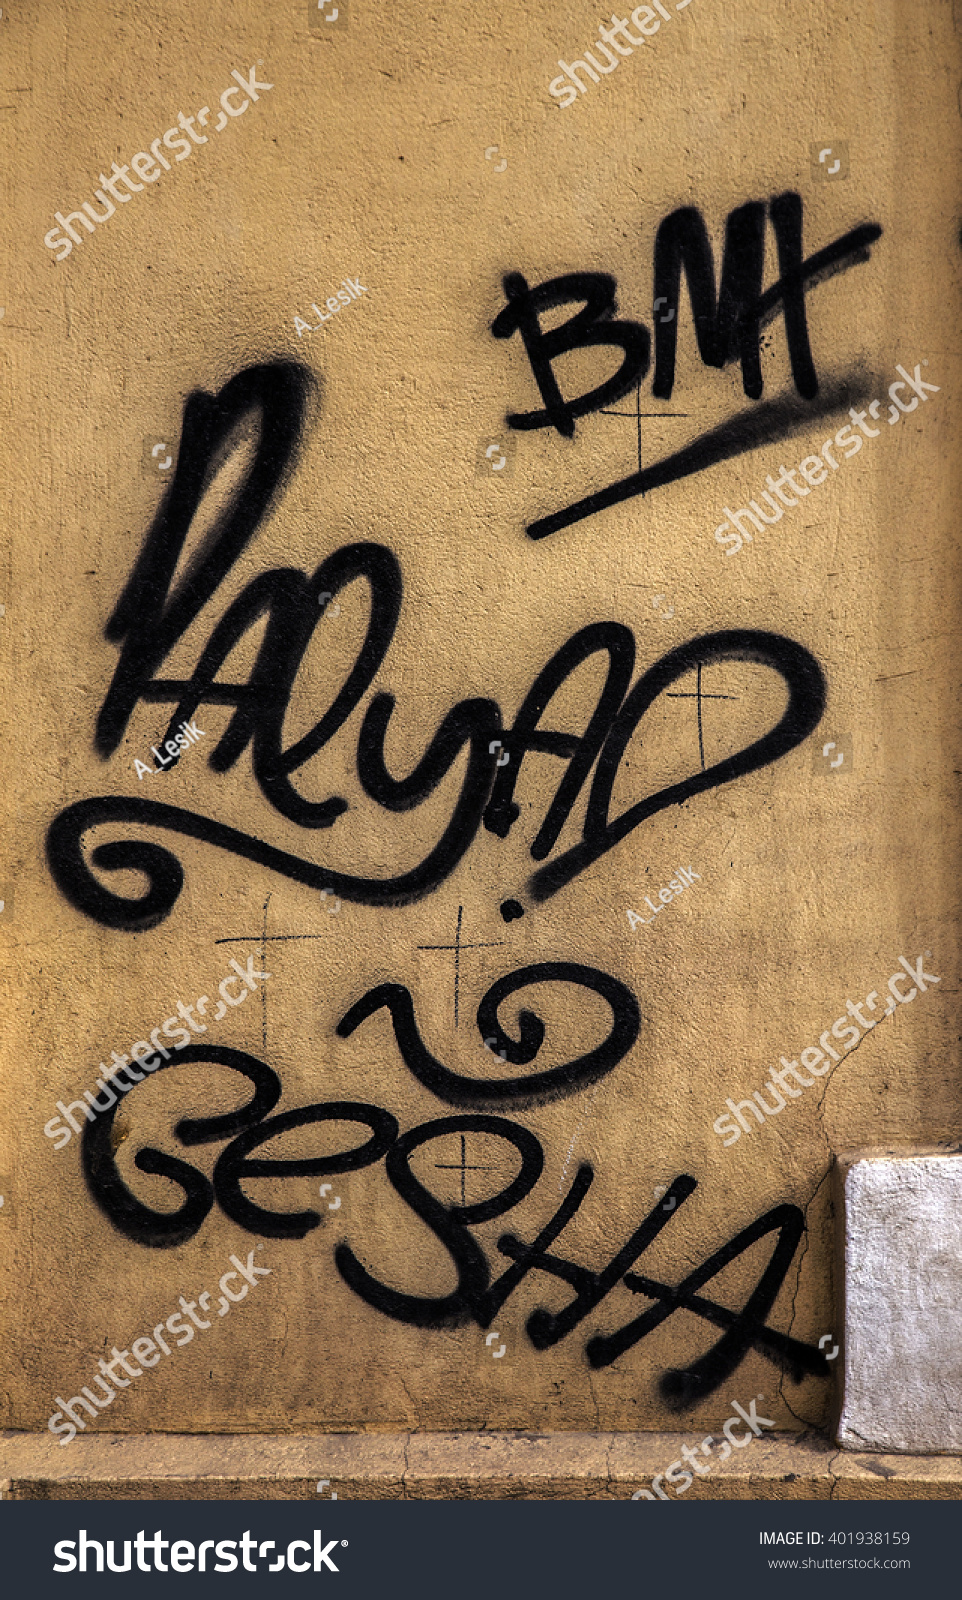 Beautiful street art graffiti abstract creative drawing fashion on walls of city urban contemporary